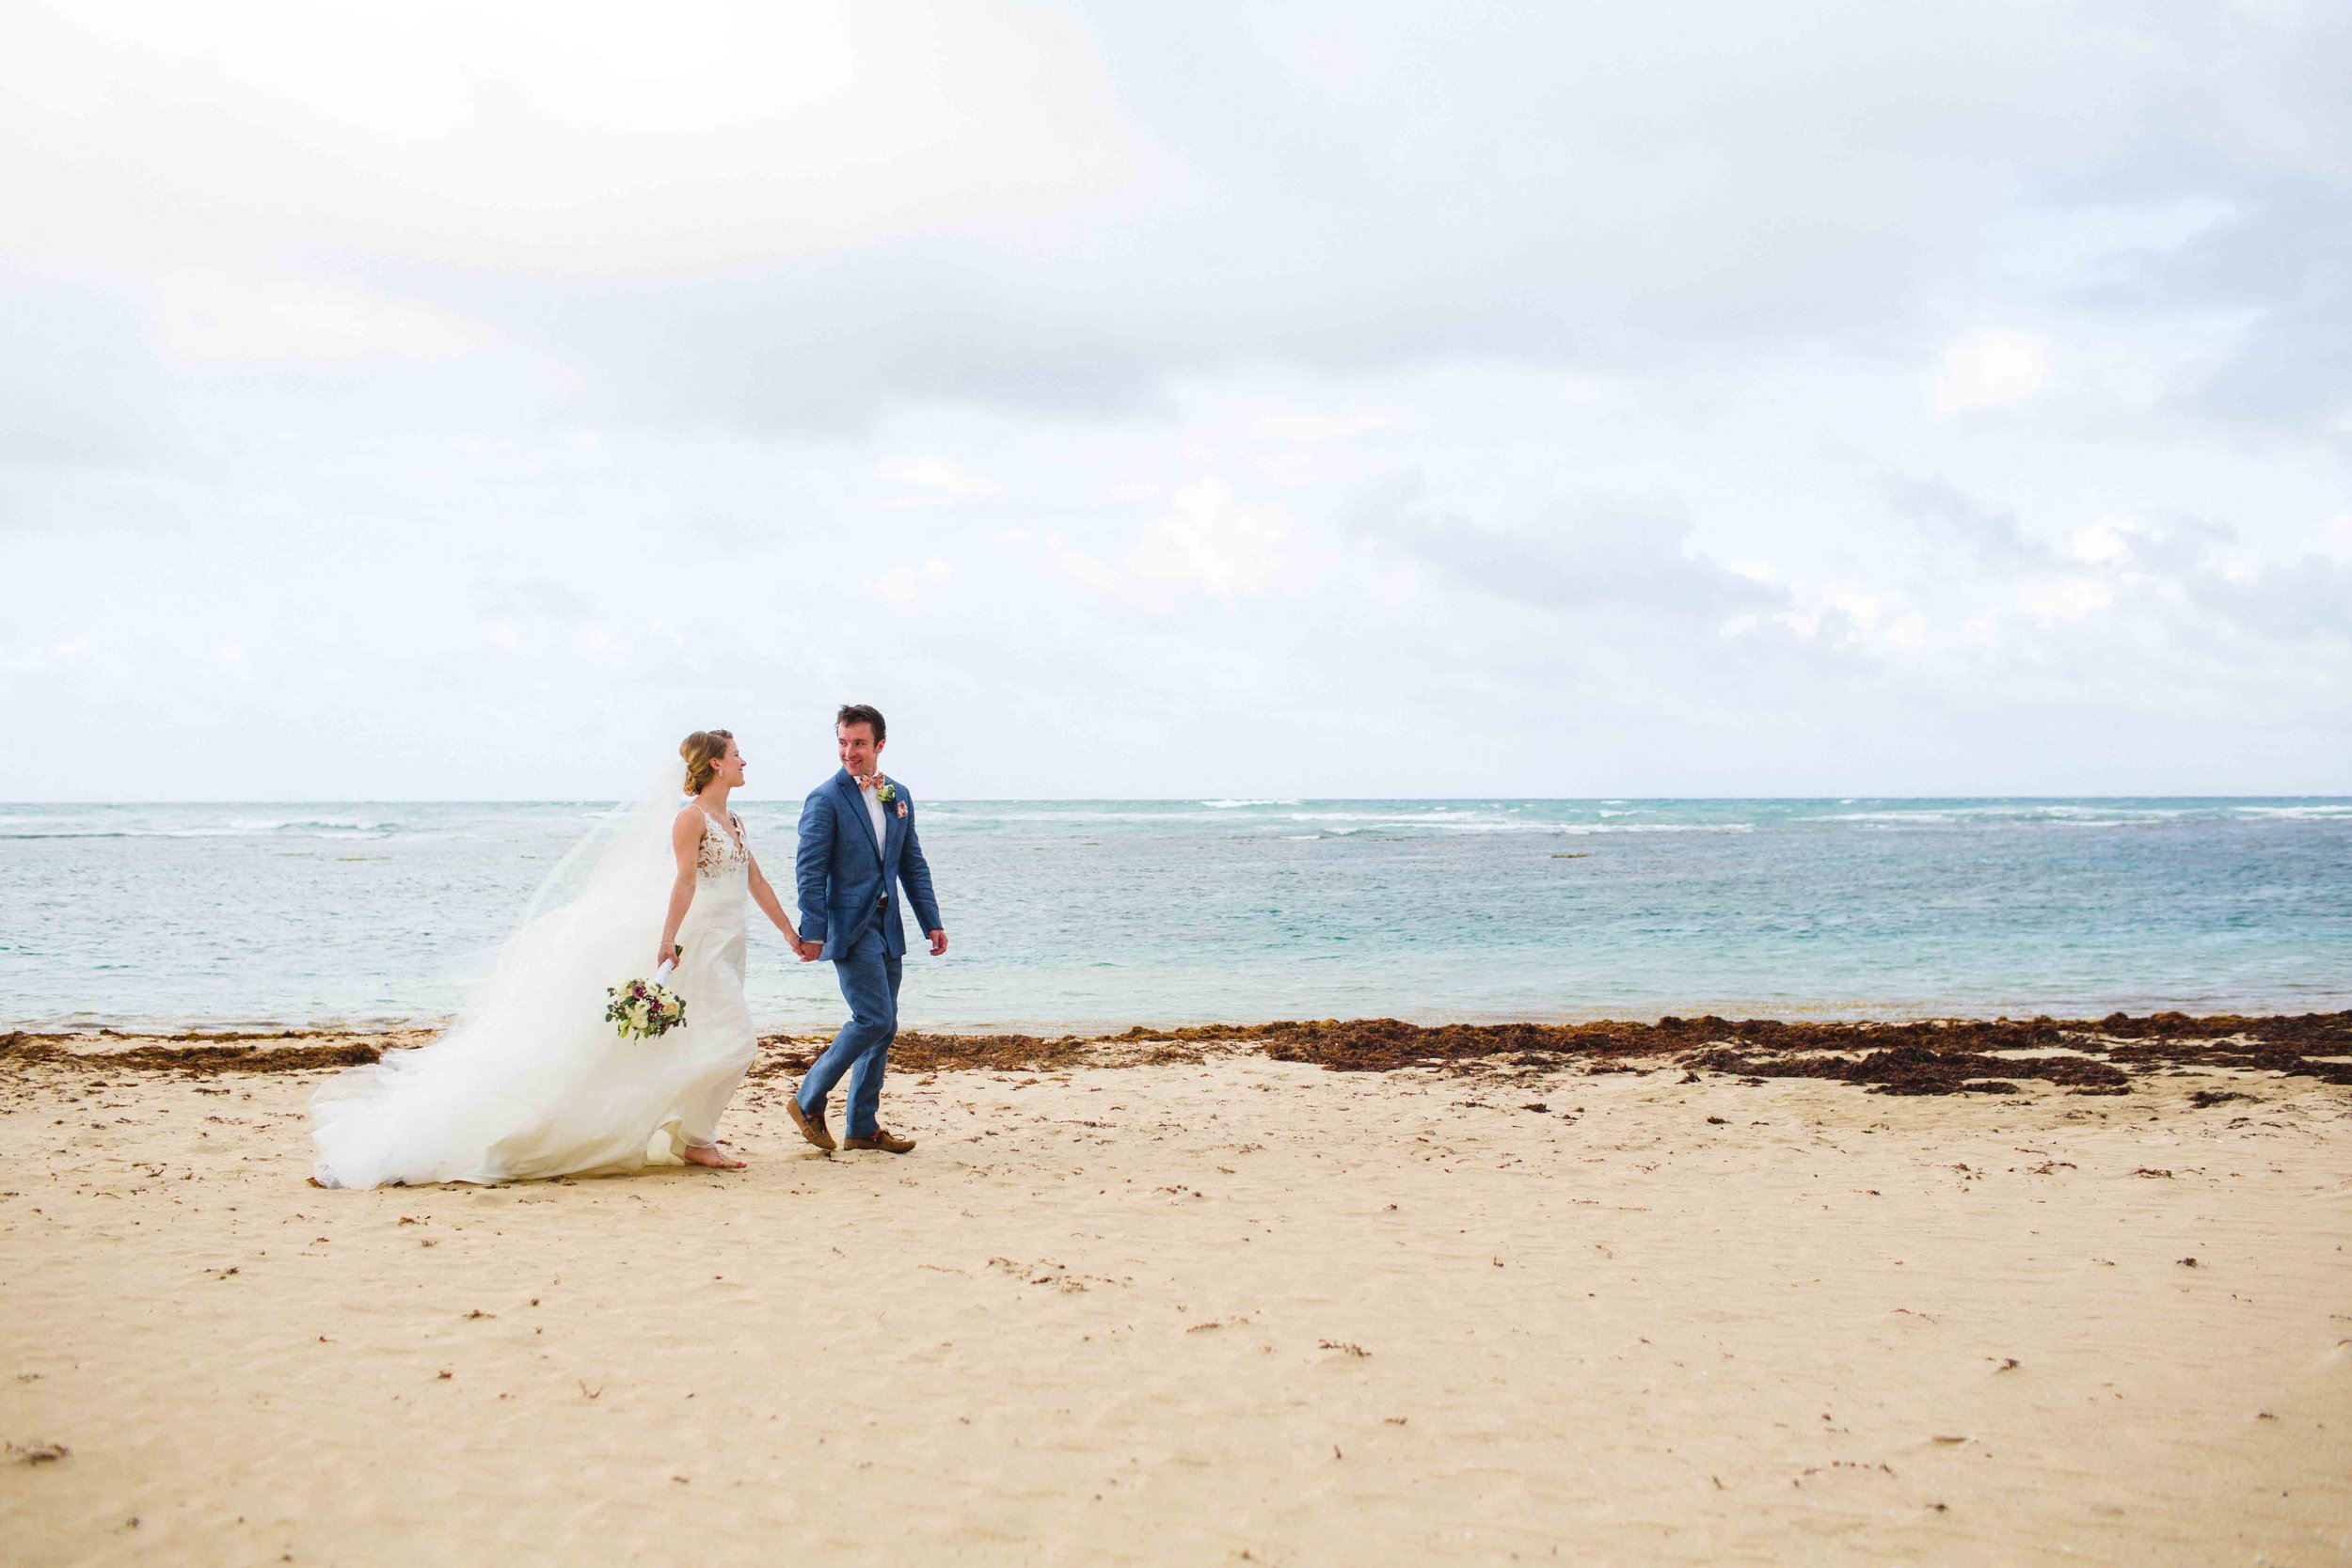 punta-cana-dominican-republic-wedding-photographer-111.jpg